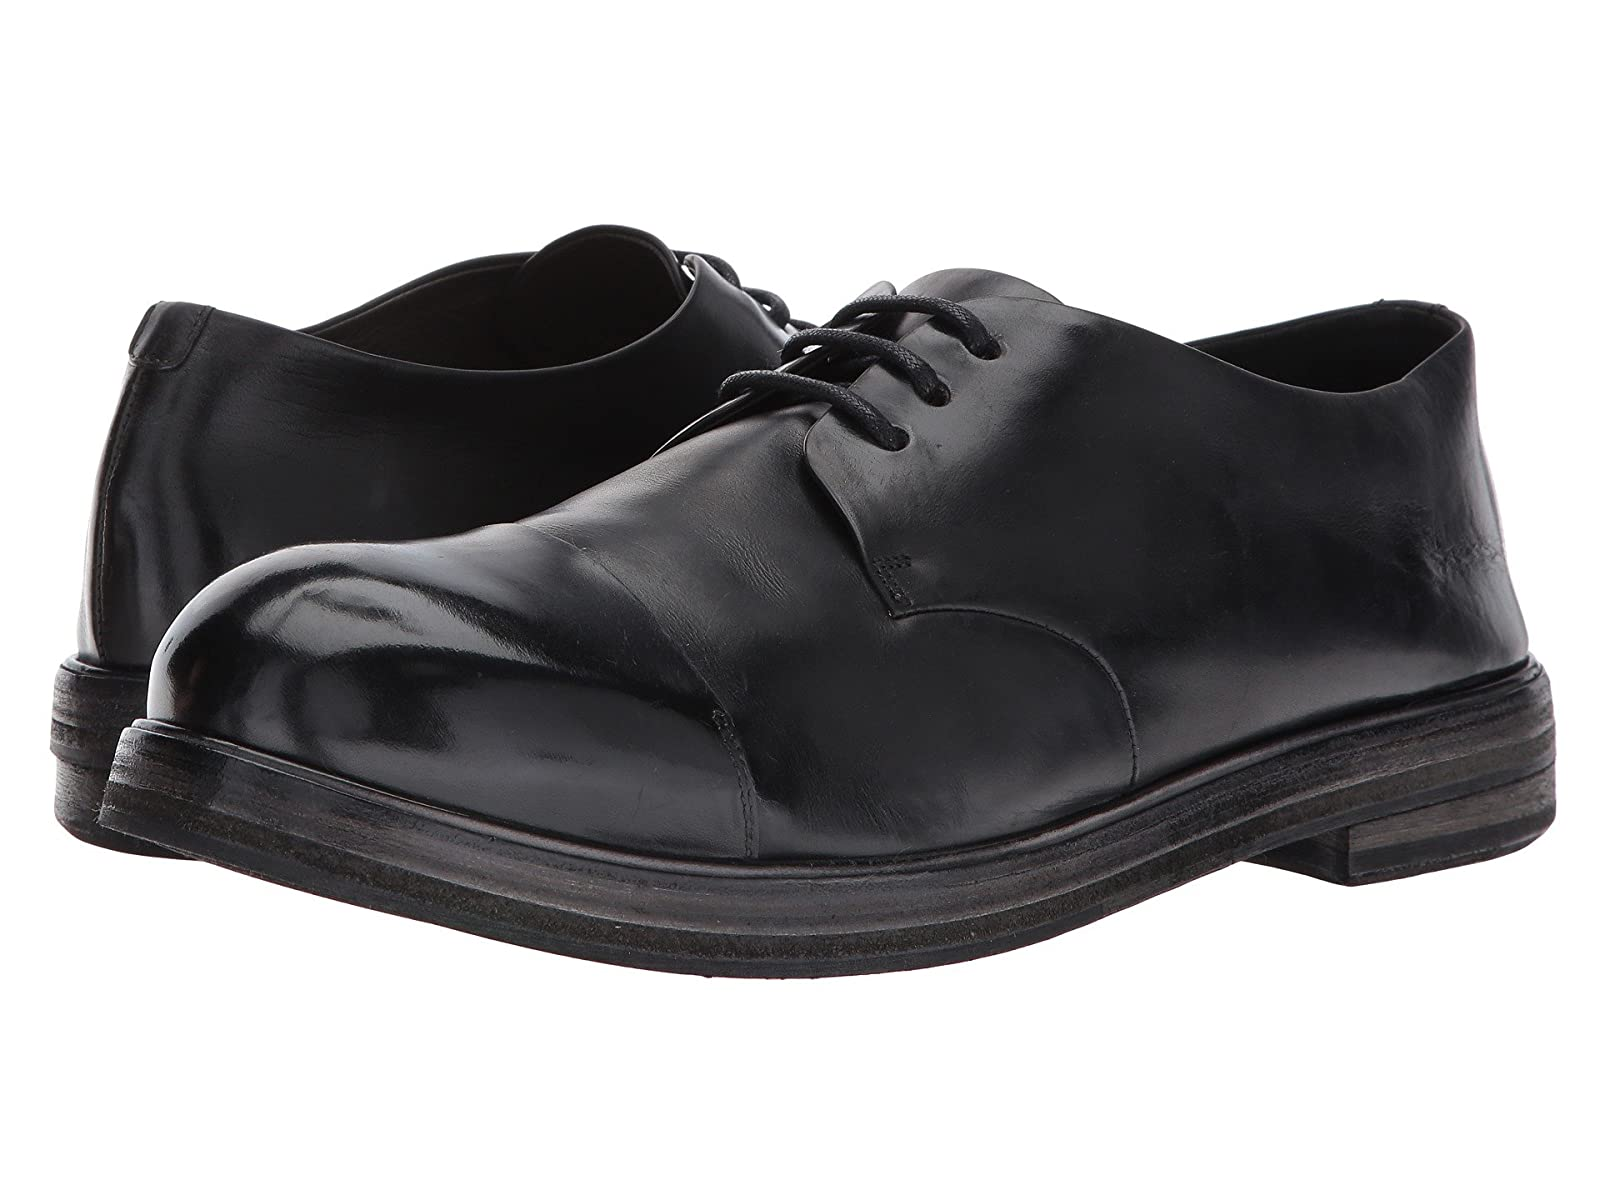 Marsell Captoe OxfordAtmospheric grades have affordable shoes